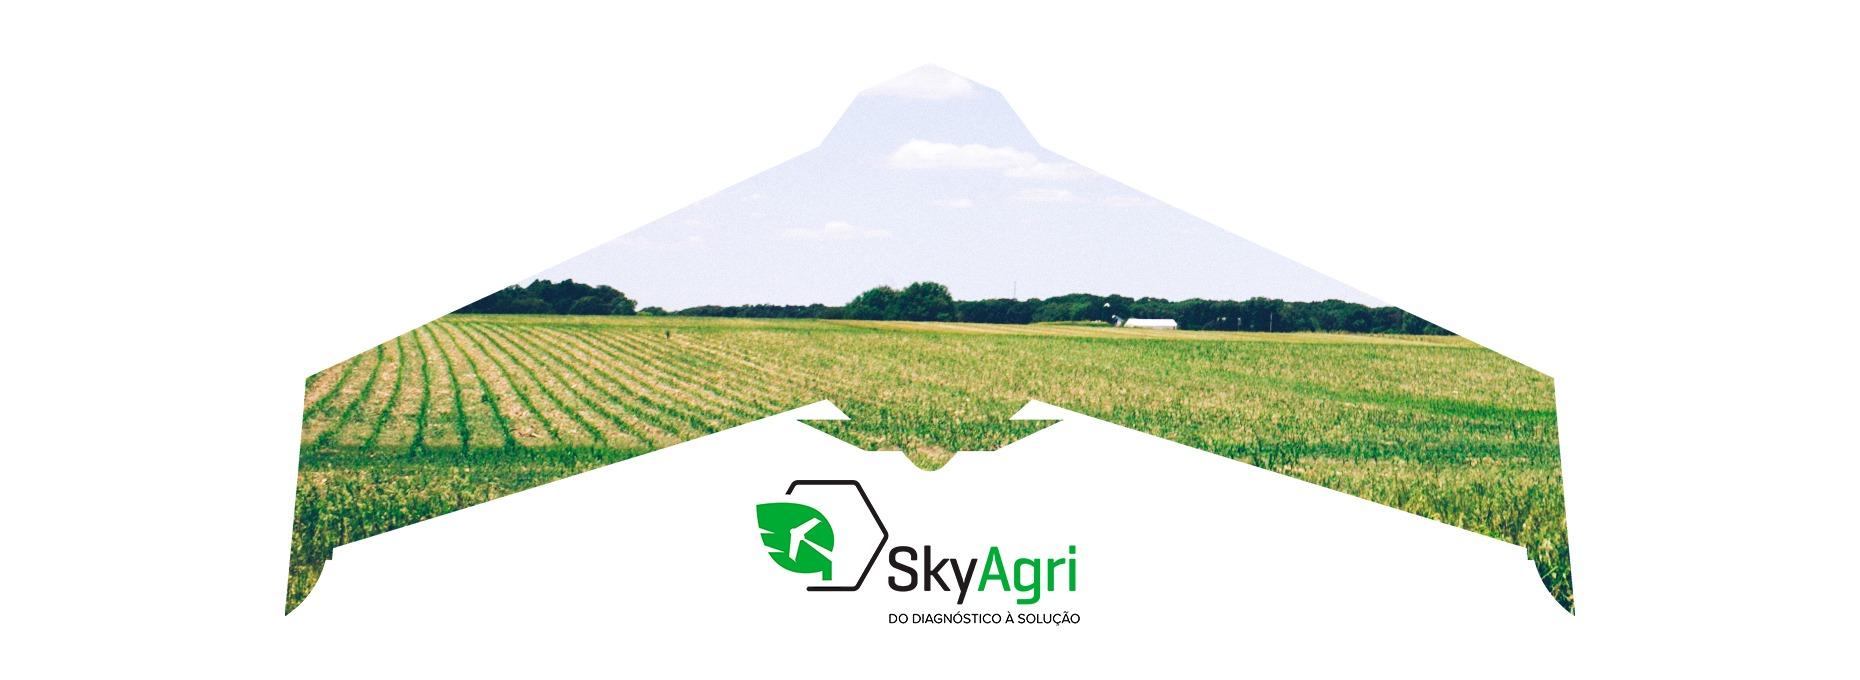 Website SkyAgri: em breve